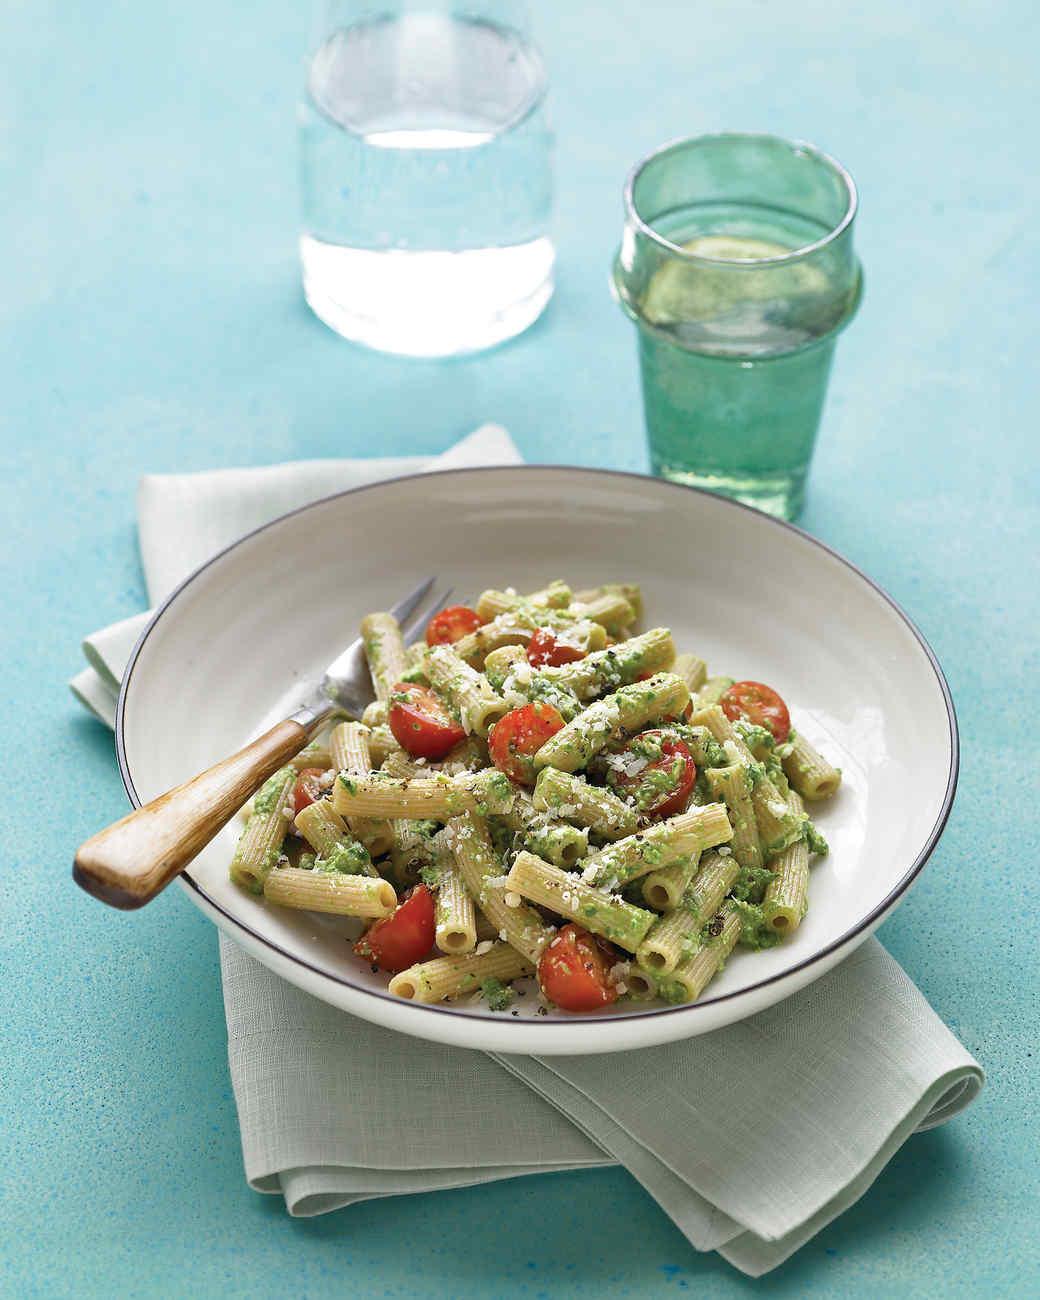 Pesto and Pasta, Recipes to Make Dinner...Like Presto! | Martha Stewart